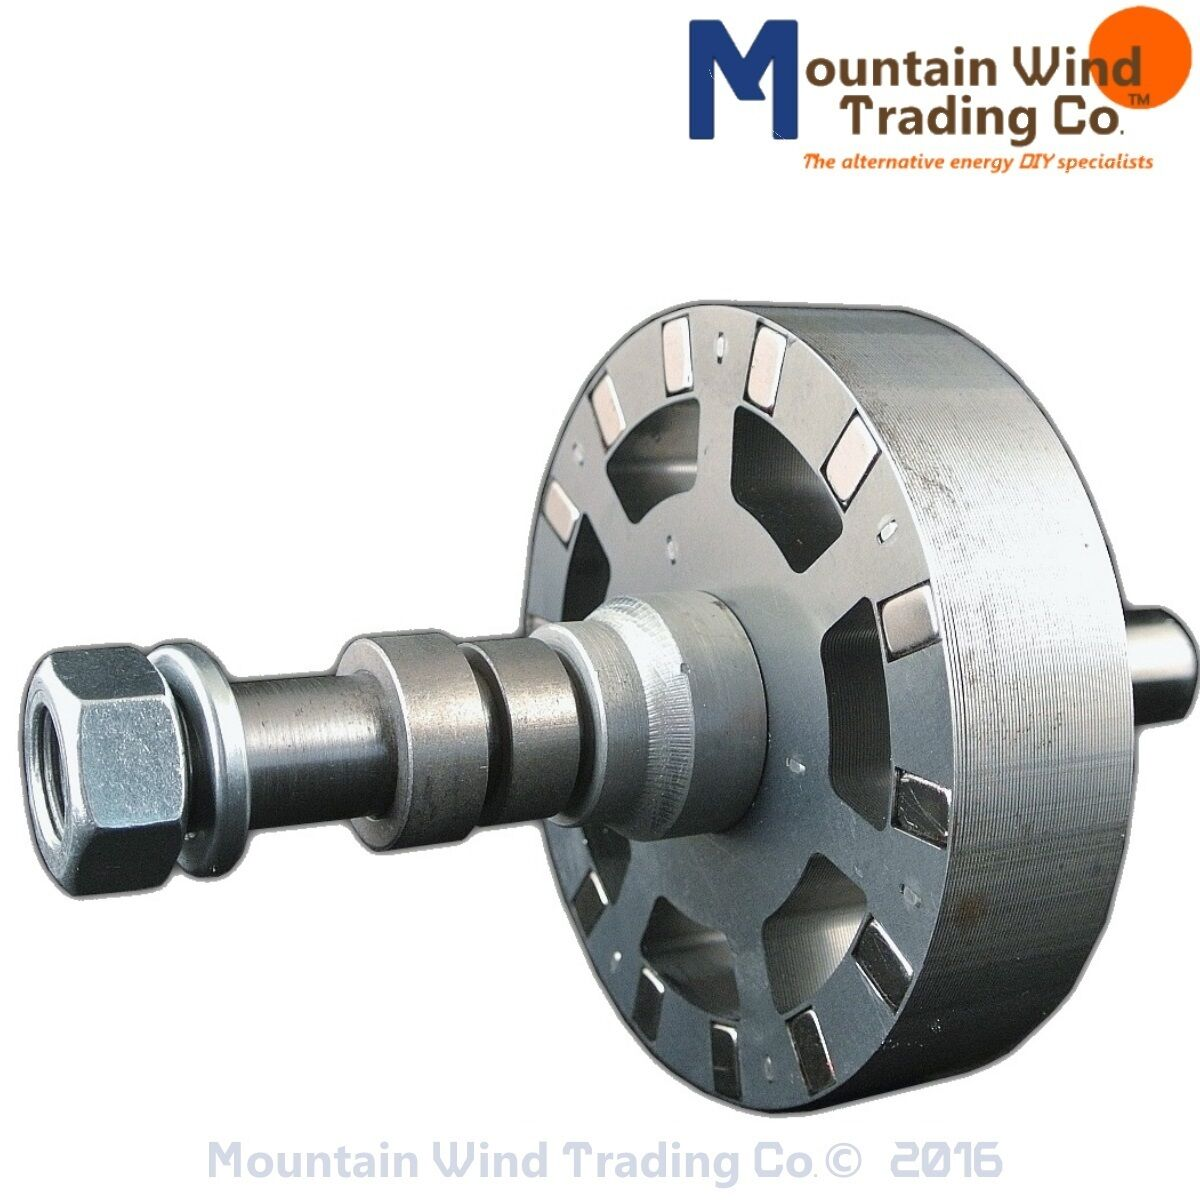 14 Magnet L Flux Pma Permanent Magnet Alternator Rotor 4